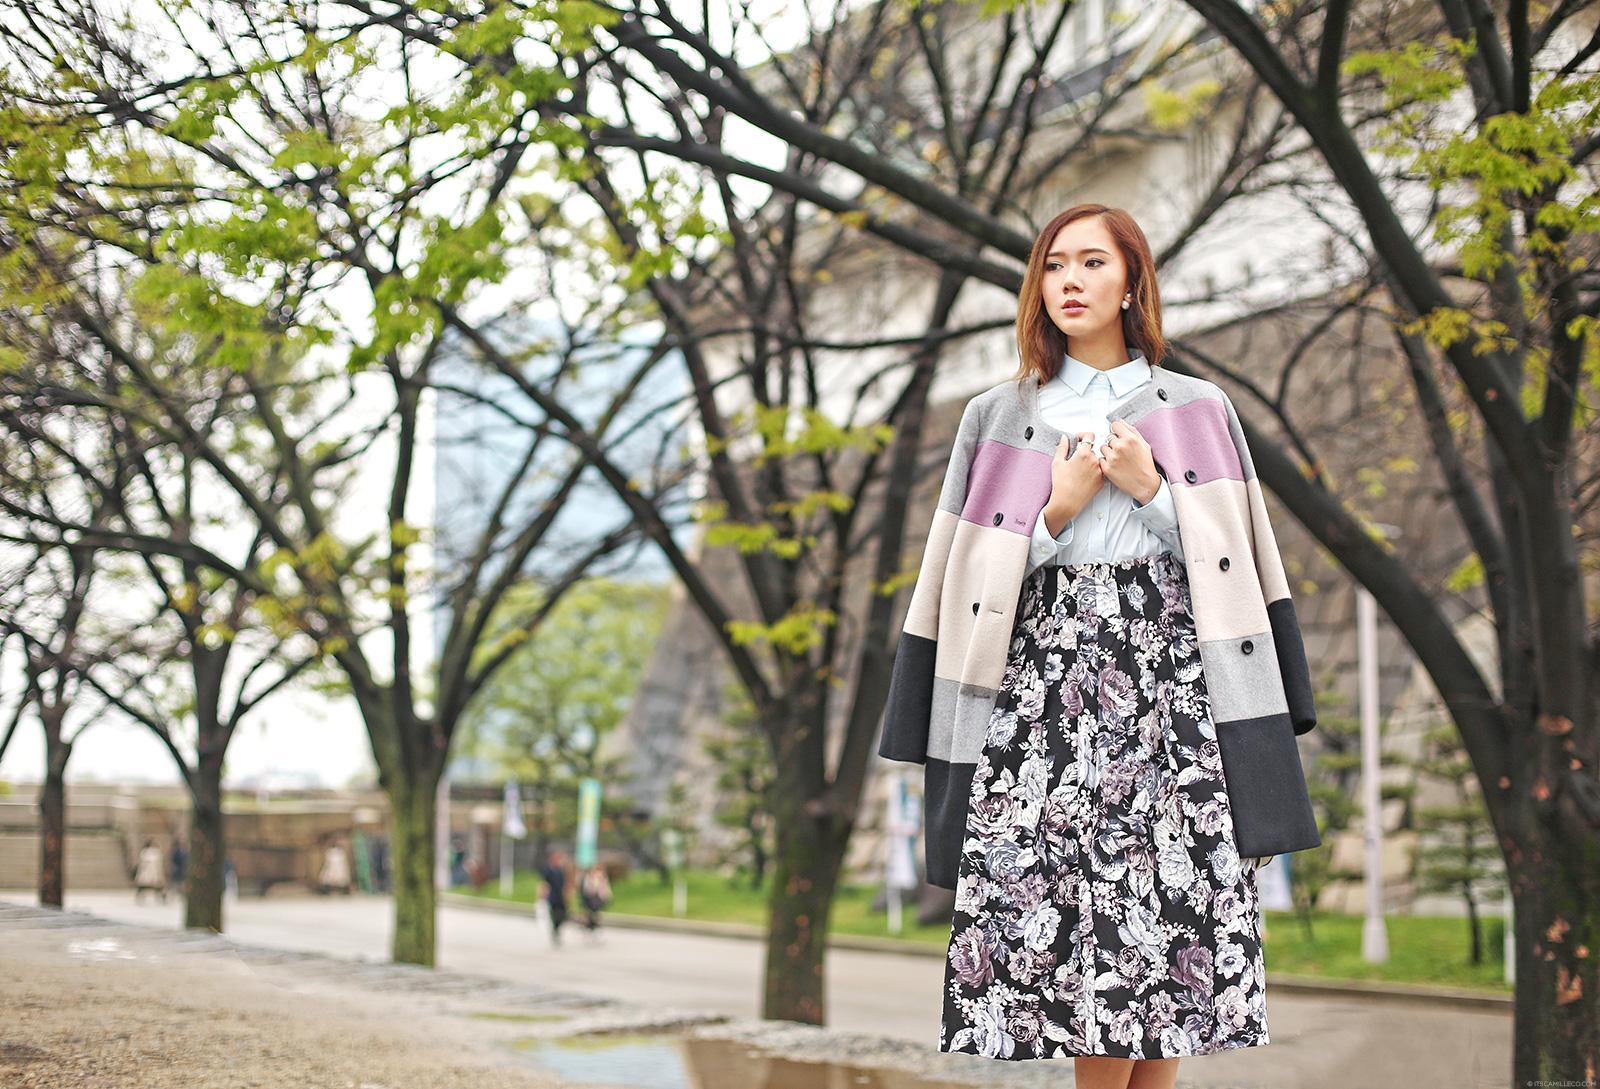 Osaka Castle | www.itscamilleco.com